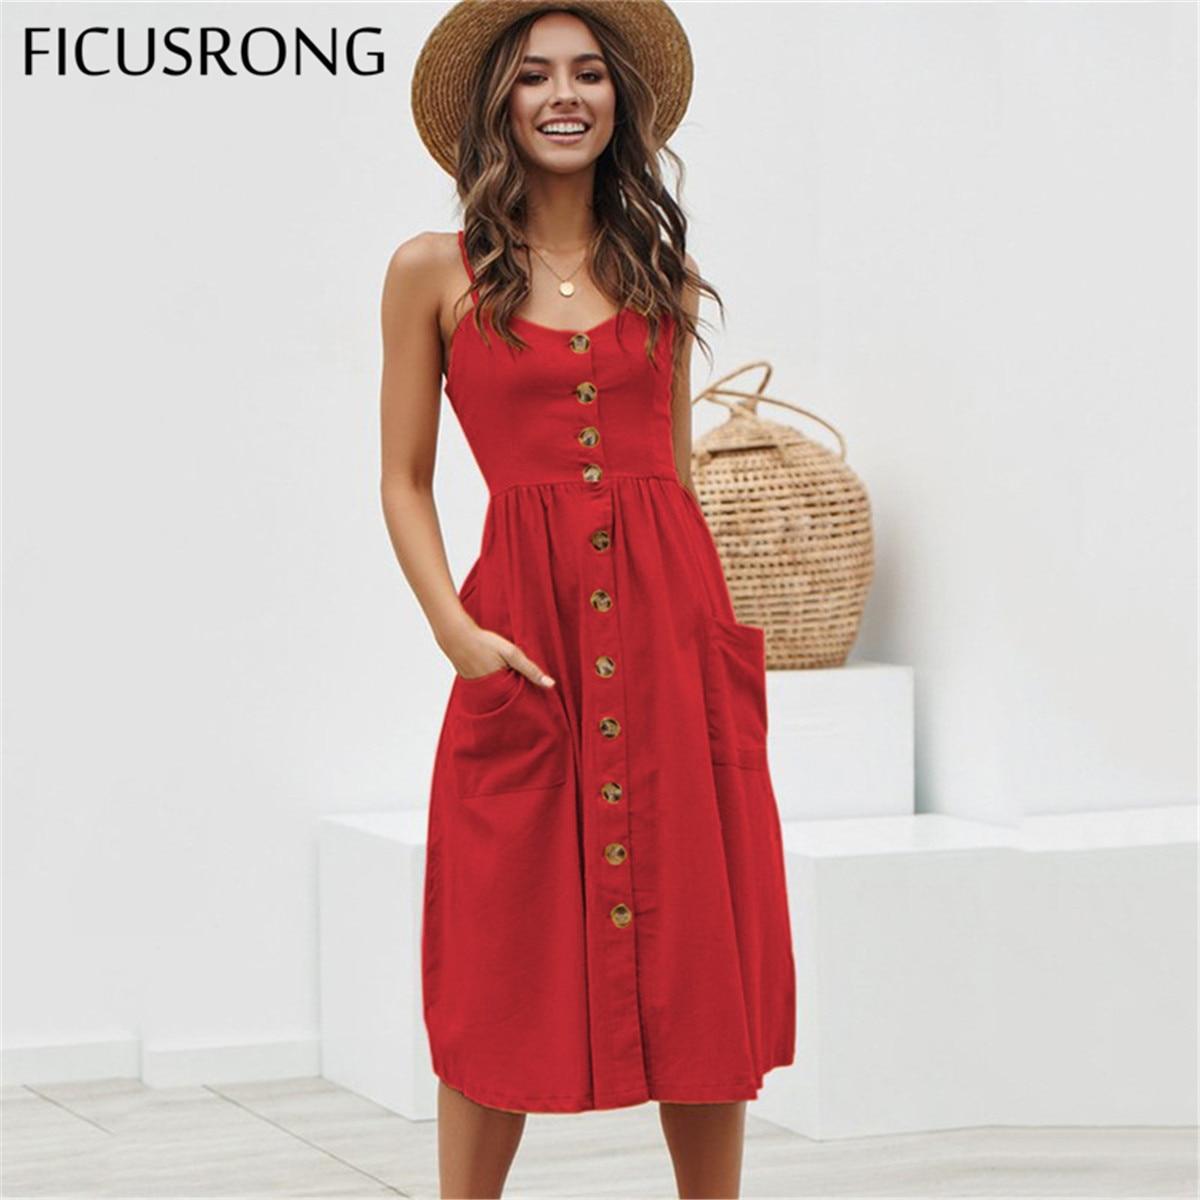 Elegant Button Women Dress Polka Dots Red Cotton Midi Dress 2019 Summer Casual Female Plus Size Lady Beach Vestidos FICUSRONG